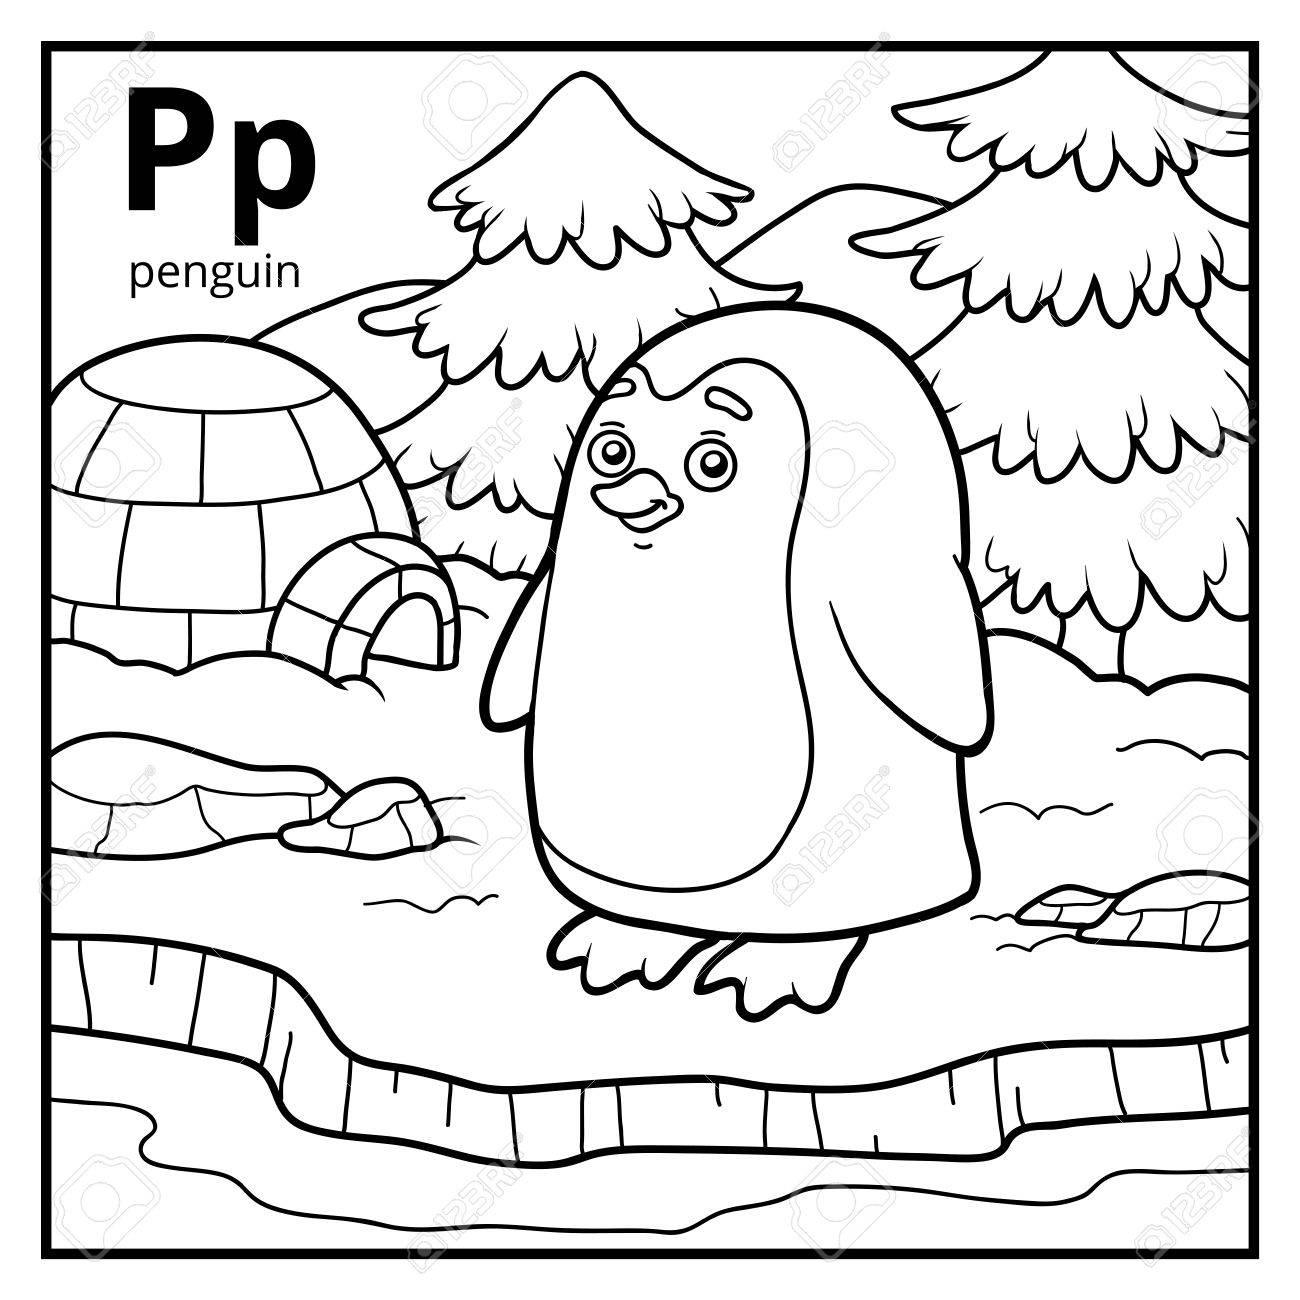 Libro Para Colorear Para Niños Alfabeto Incoloro Letra P Pingüino